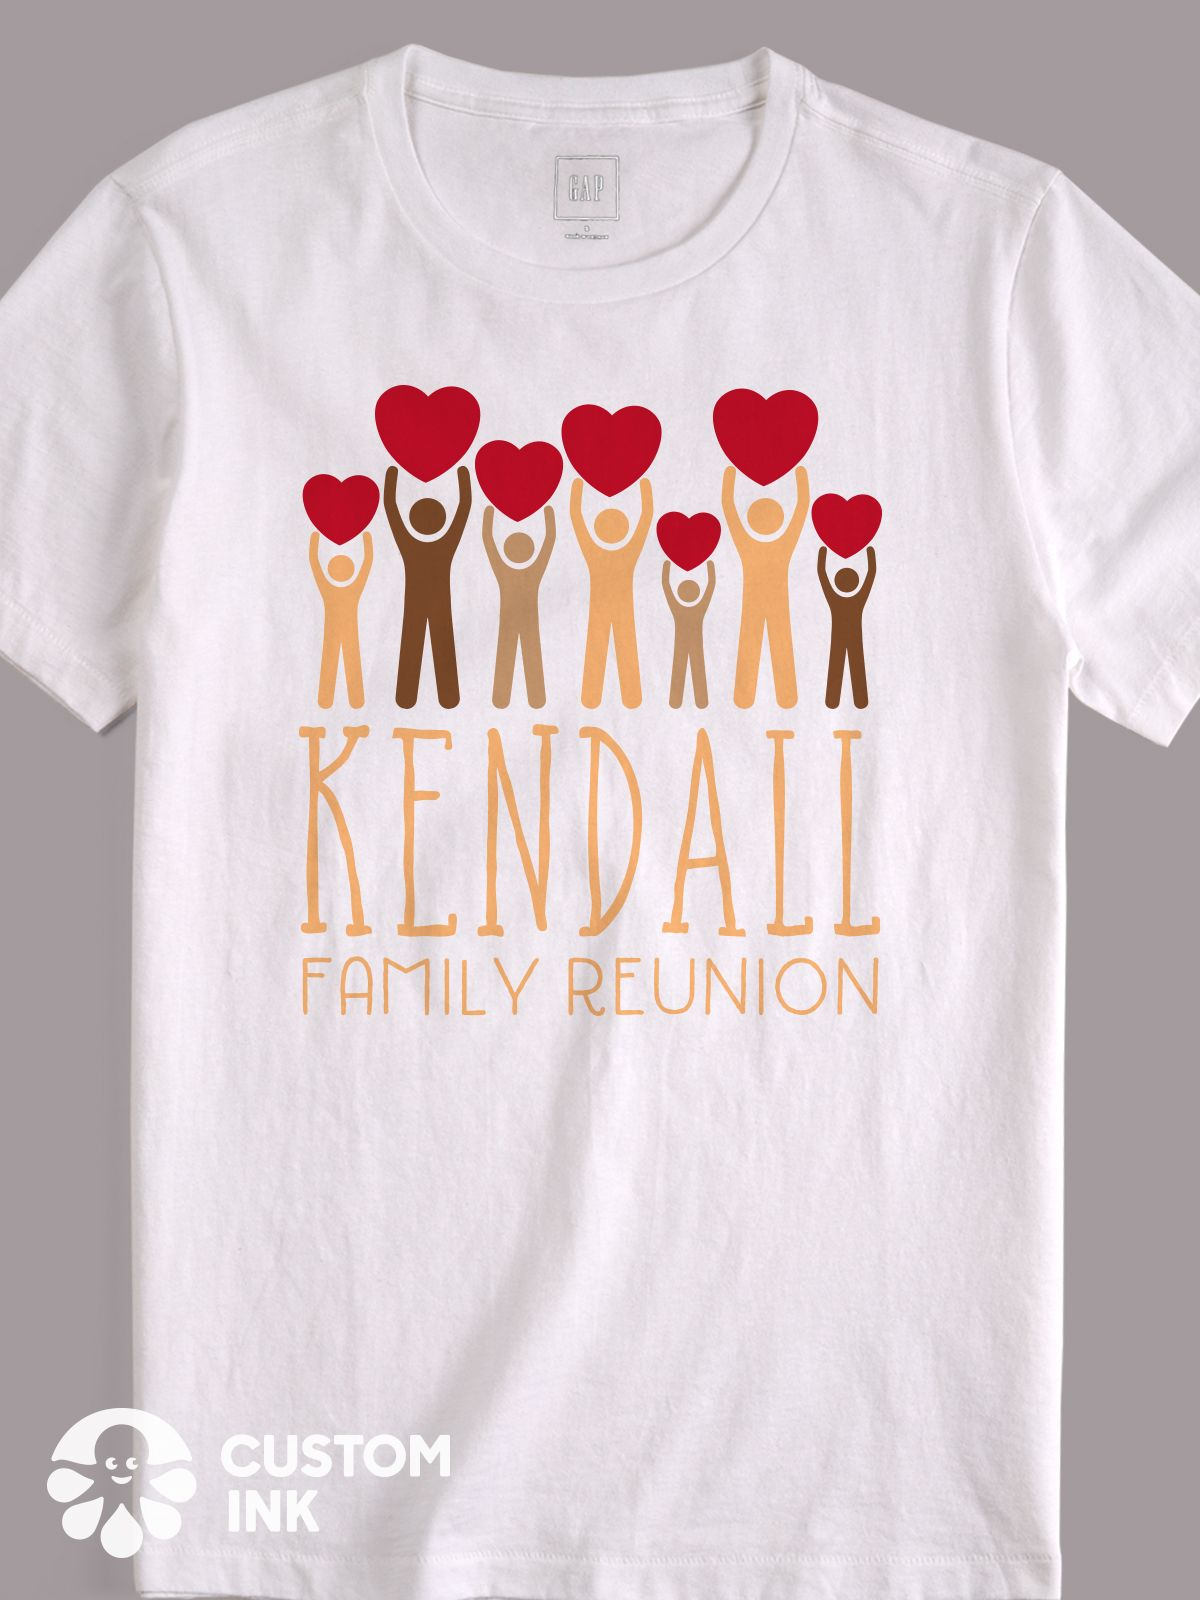 Great design idea for custom family reunion t-shirts, shirts, tees ...